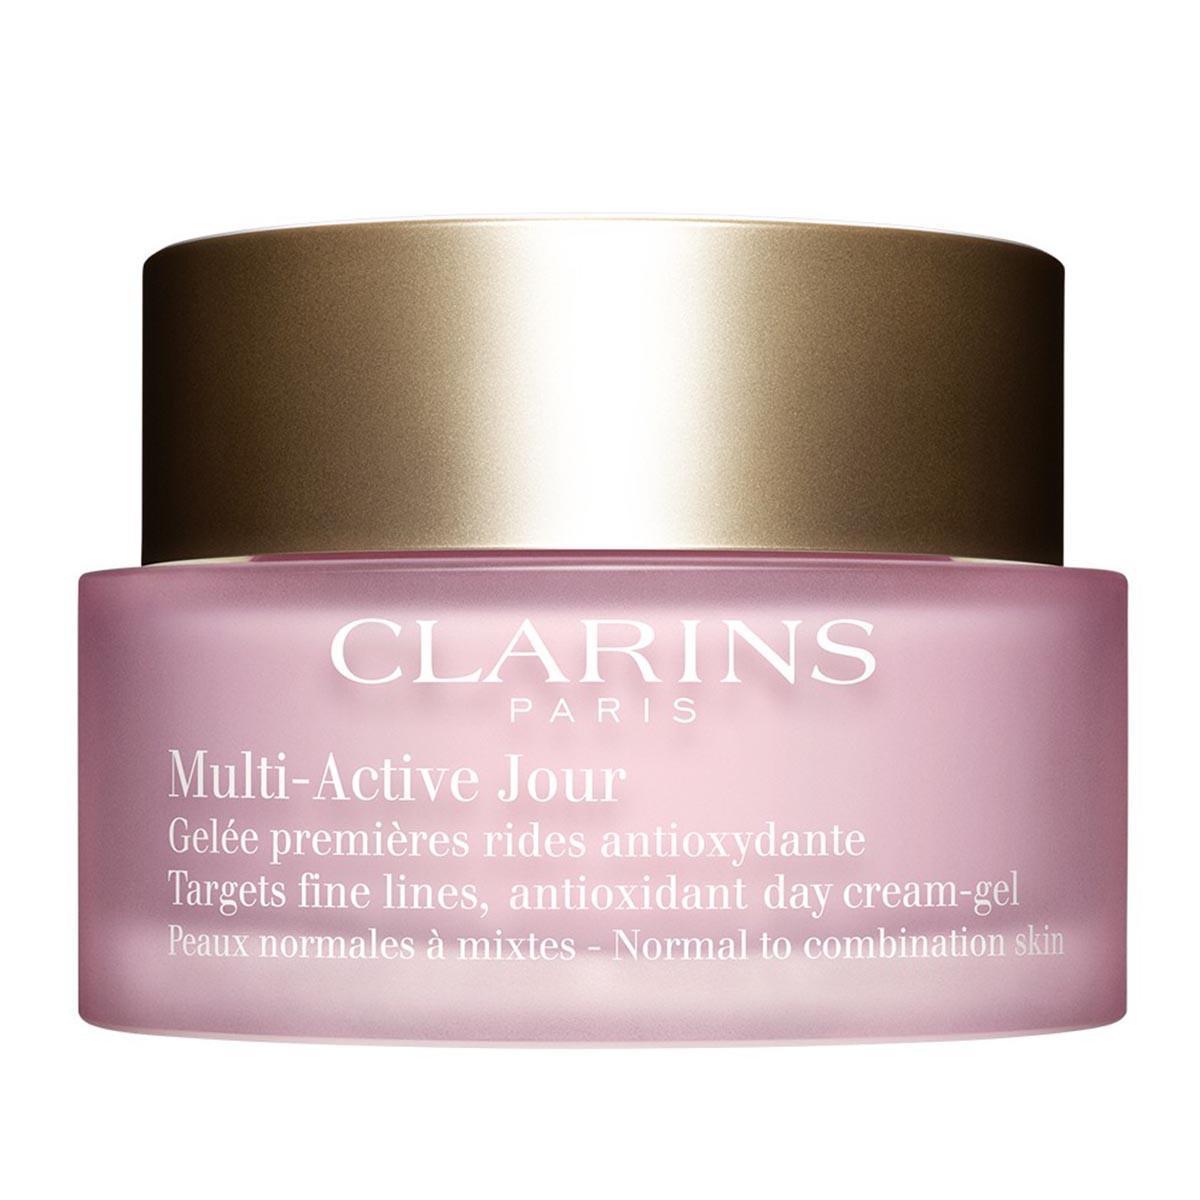 Clarins Multiactive Day Cream Gel Normal Skin 50ml One Size